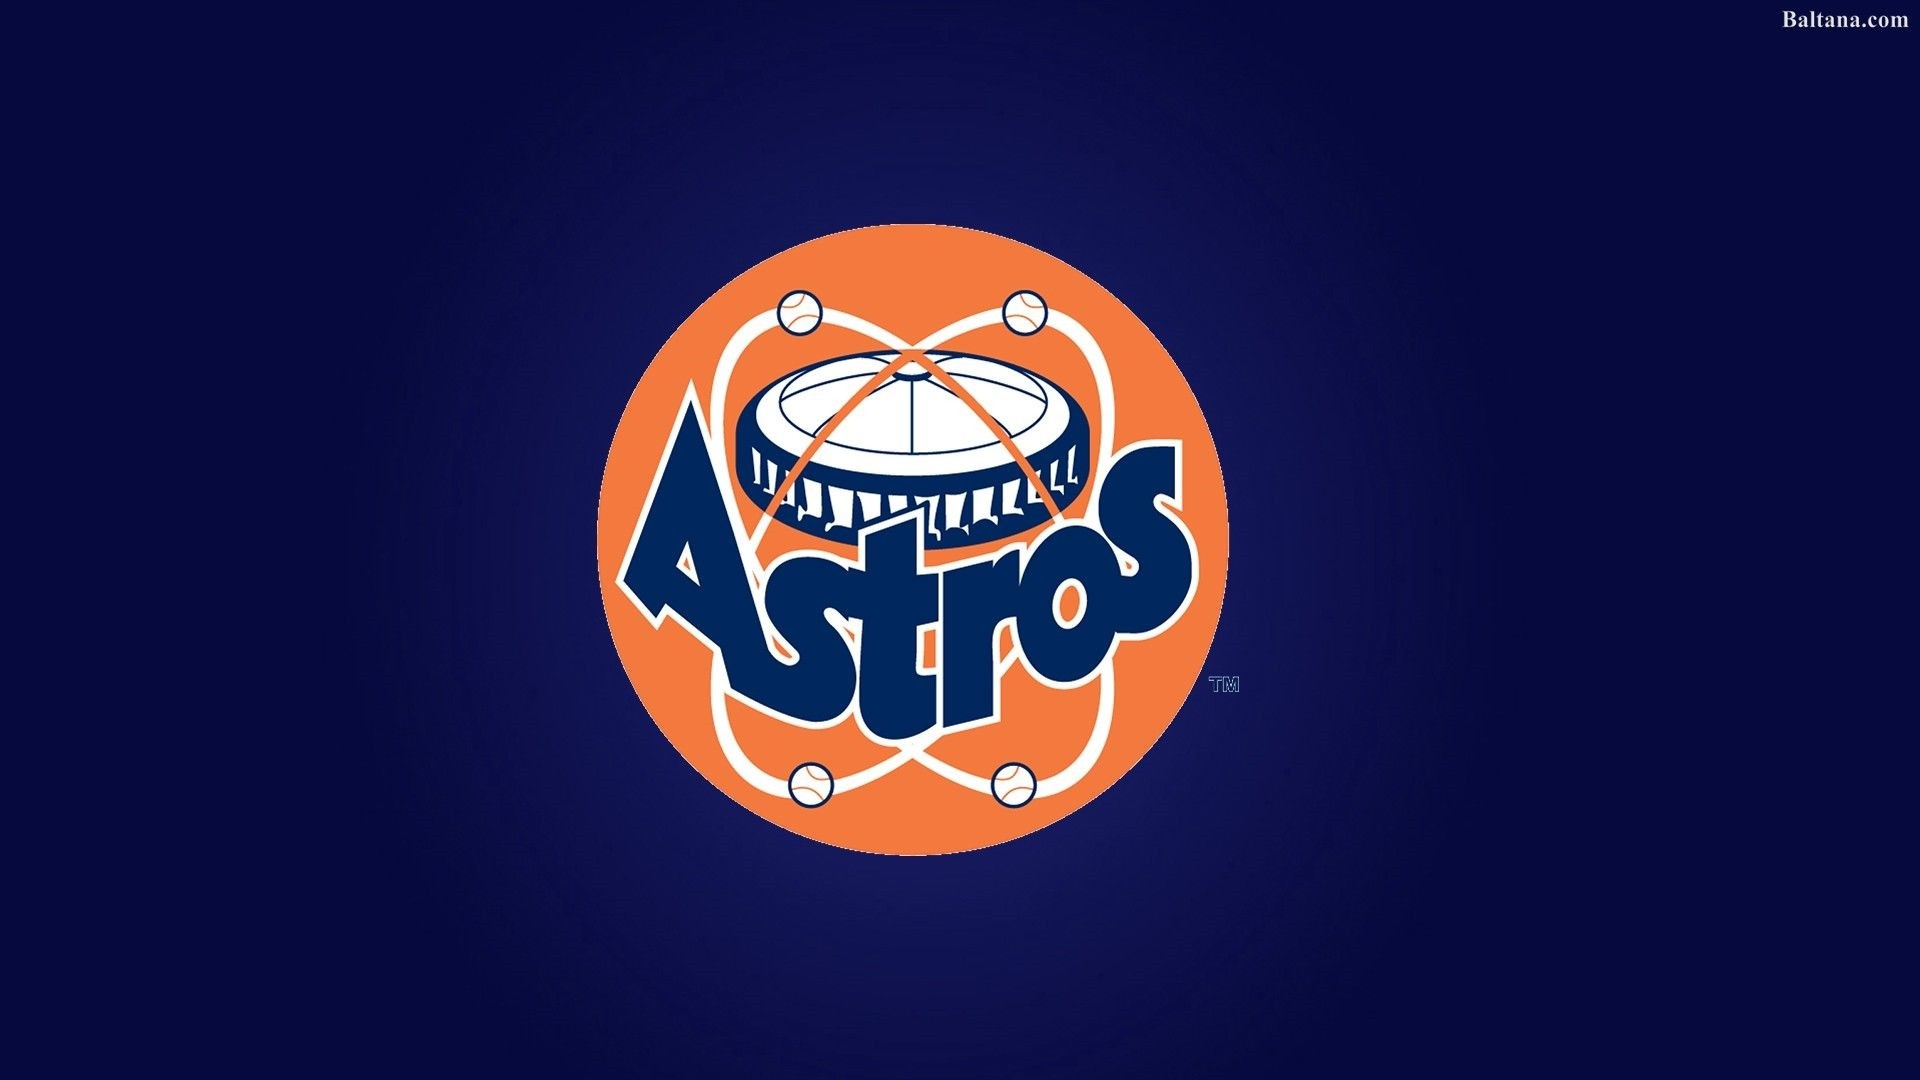 Houston Astros wallpaper photo hd